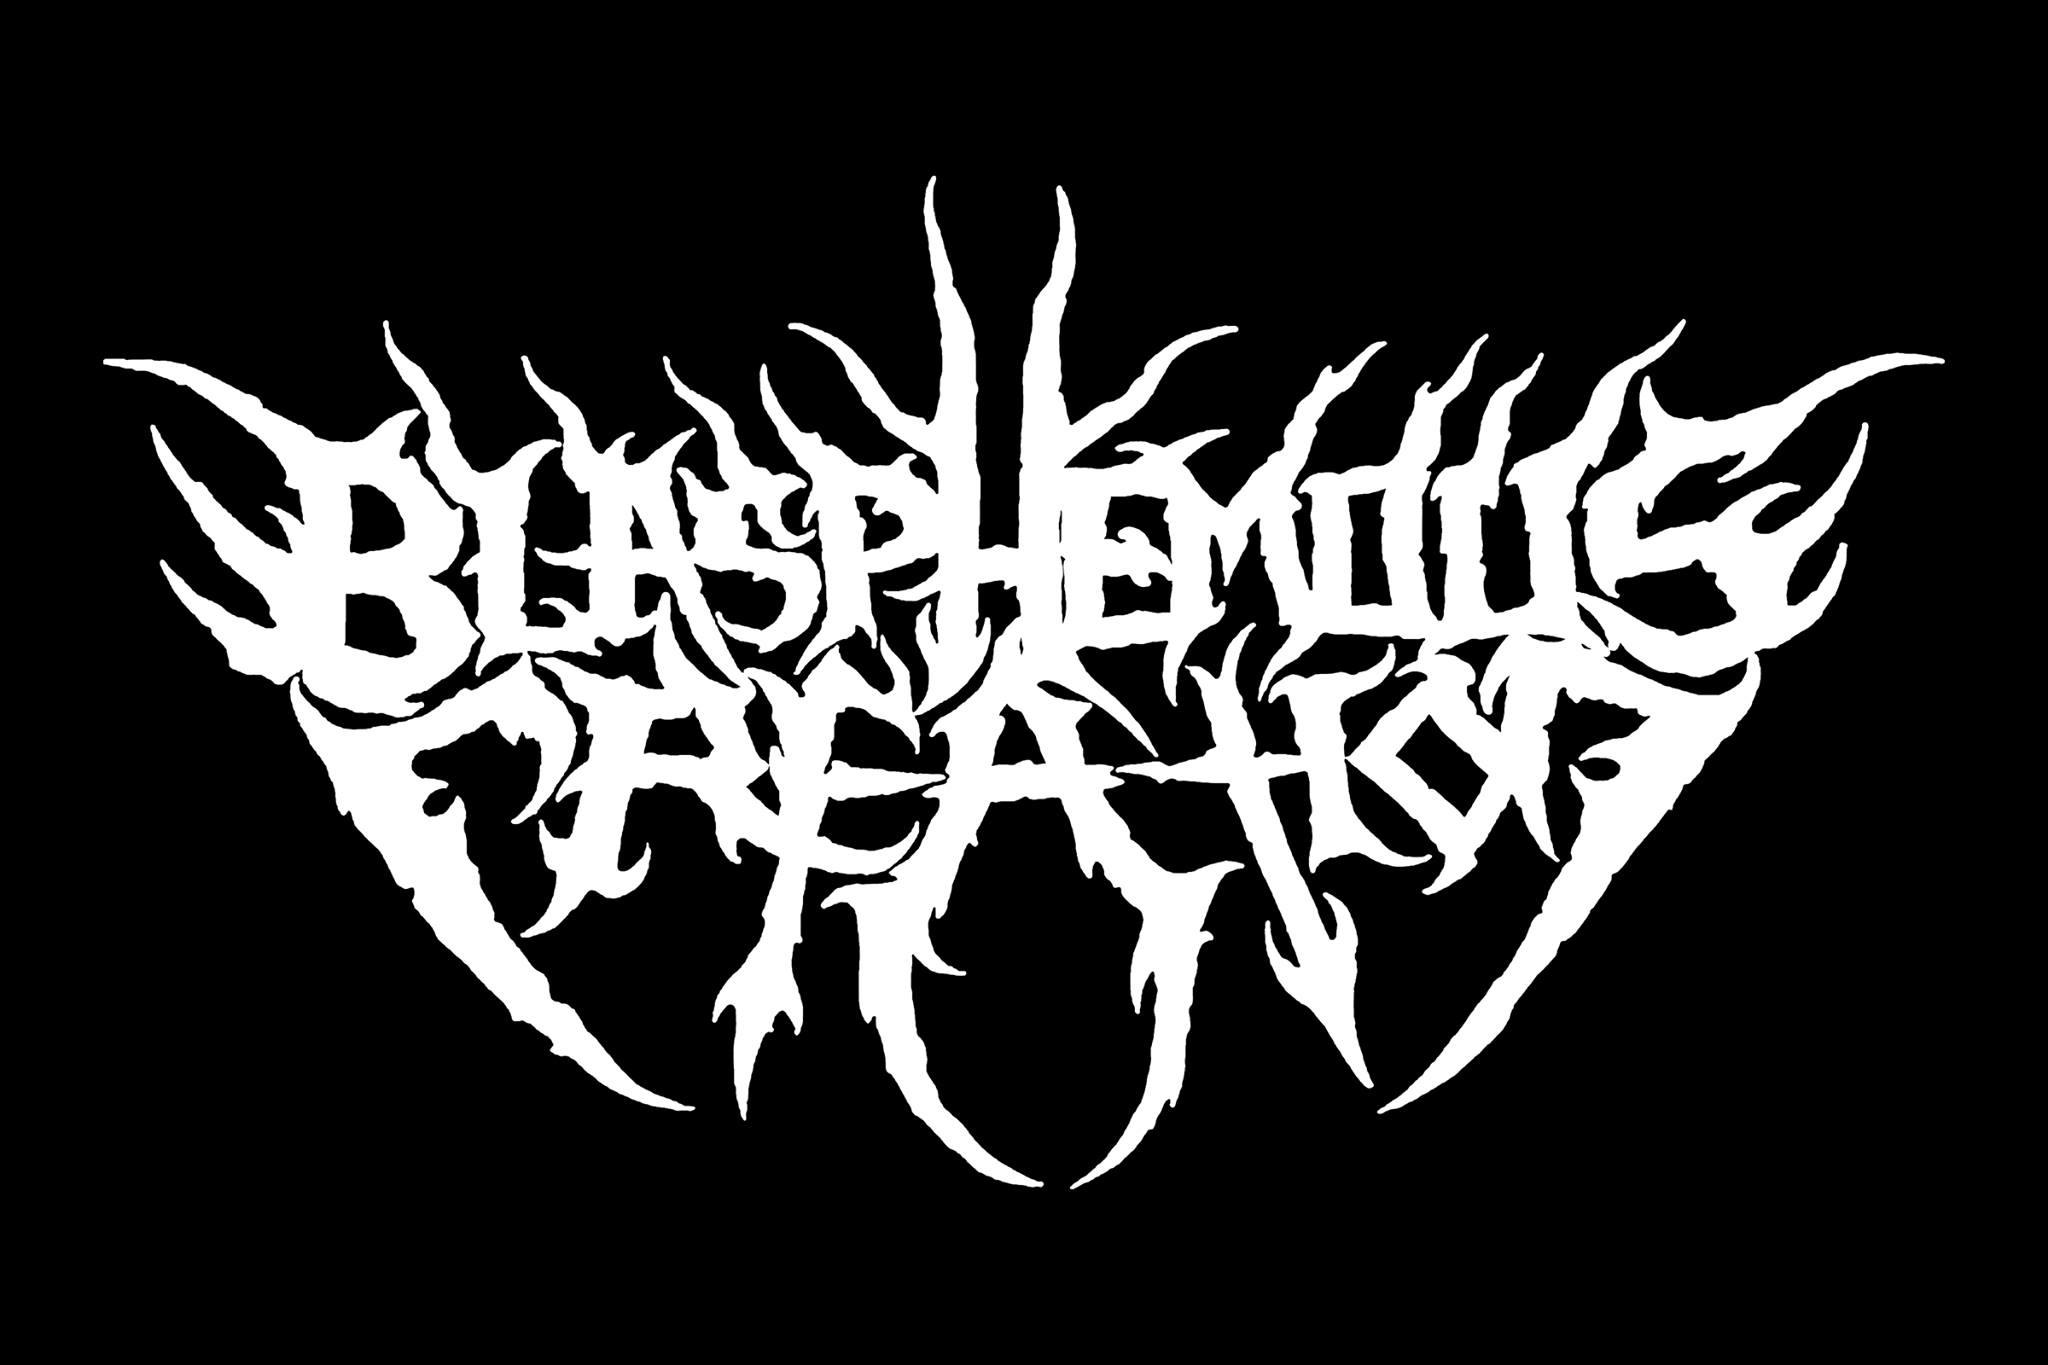 blasphemous creation